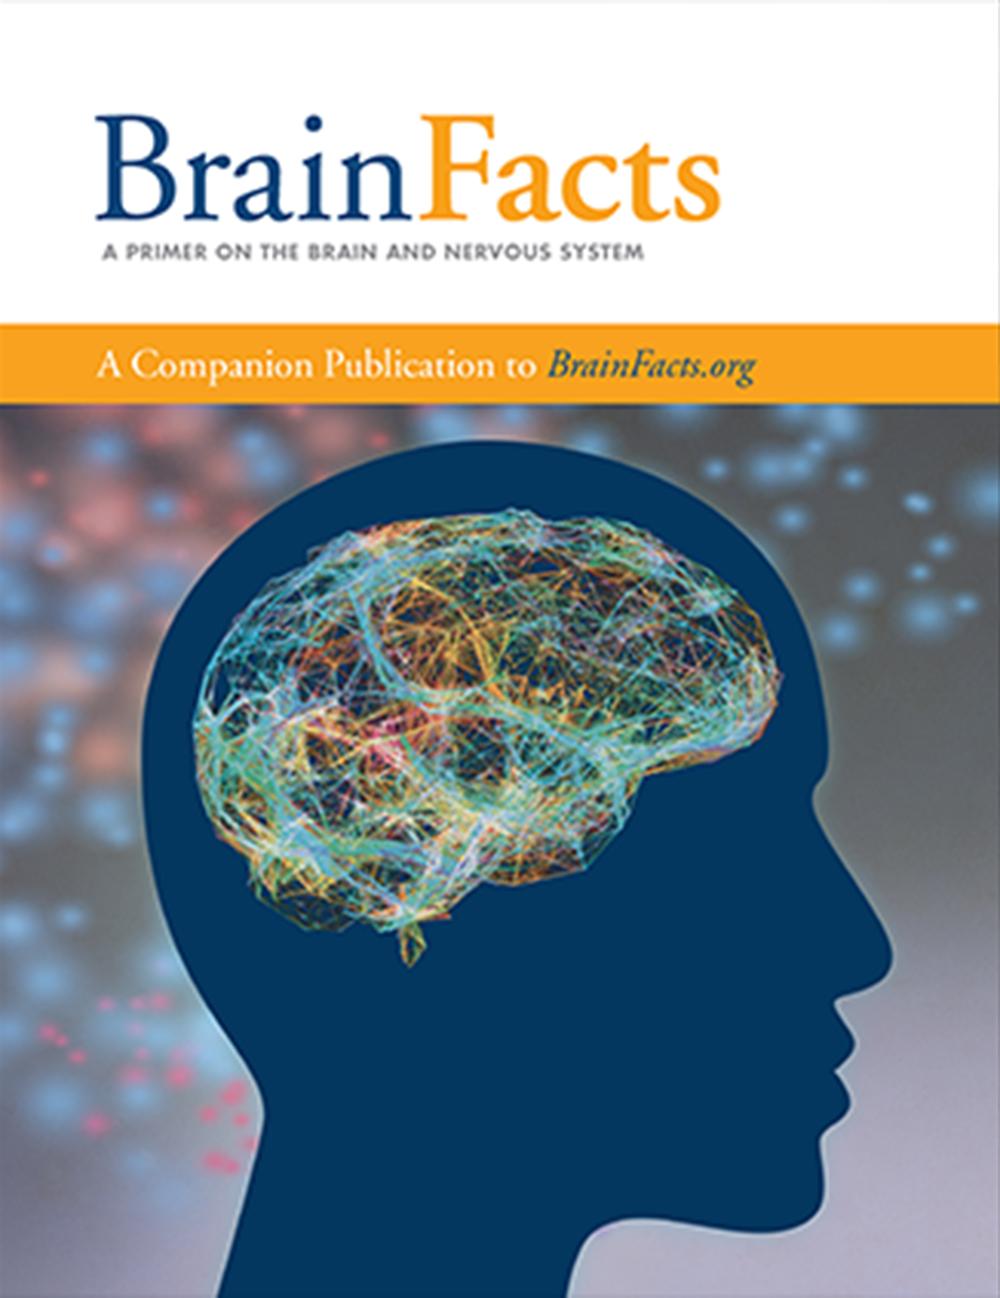 brainfactsbook_spotlight 2018 cropped.png